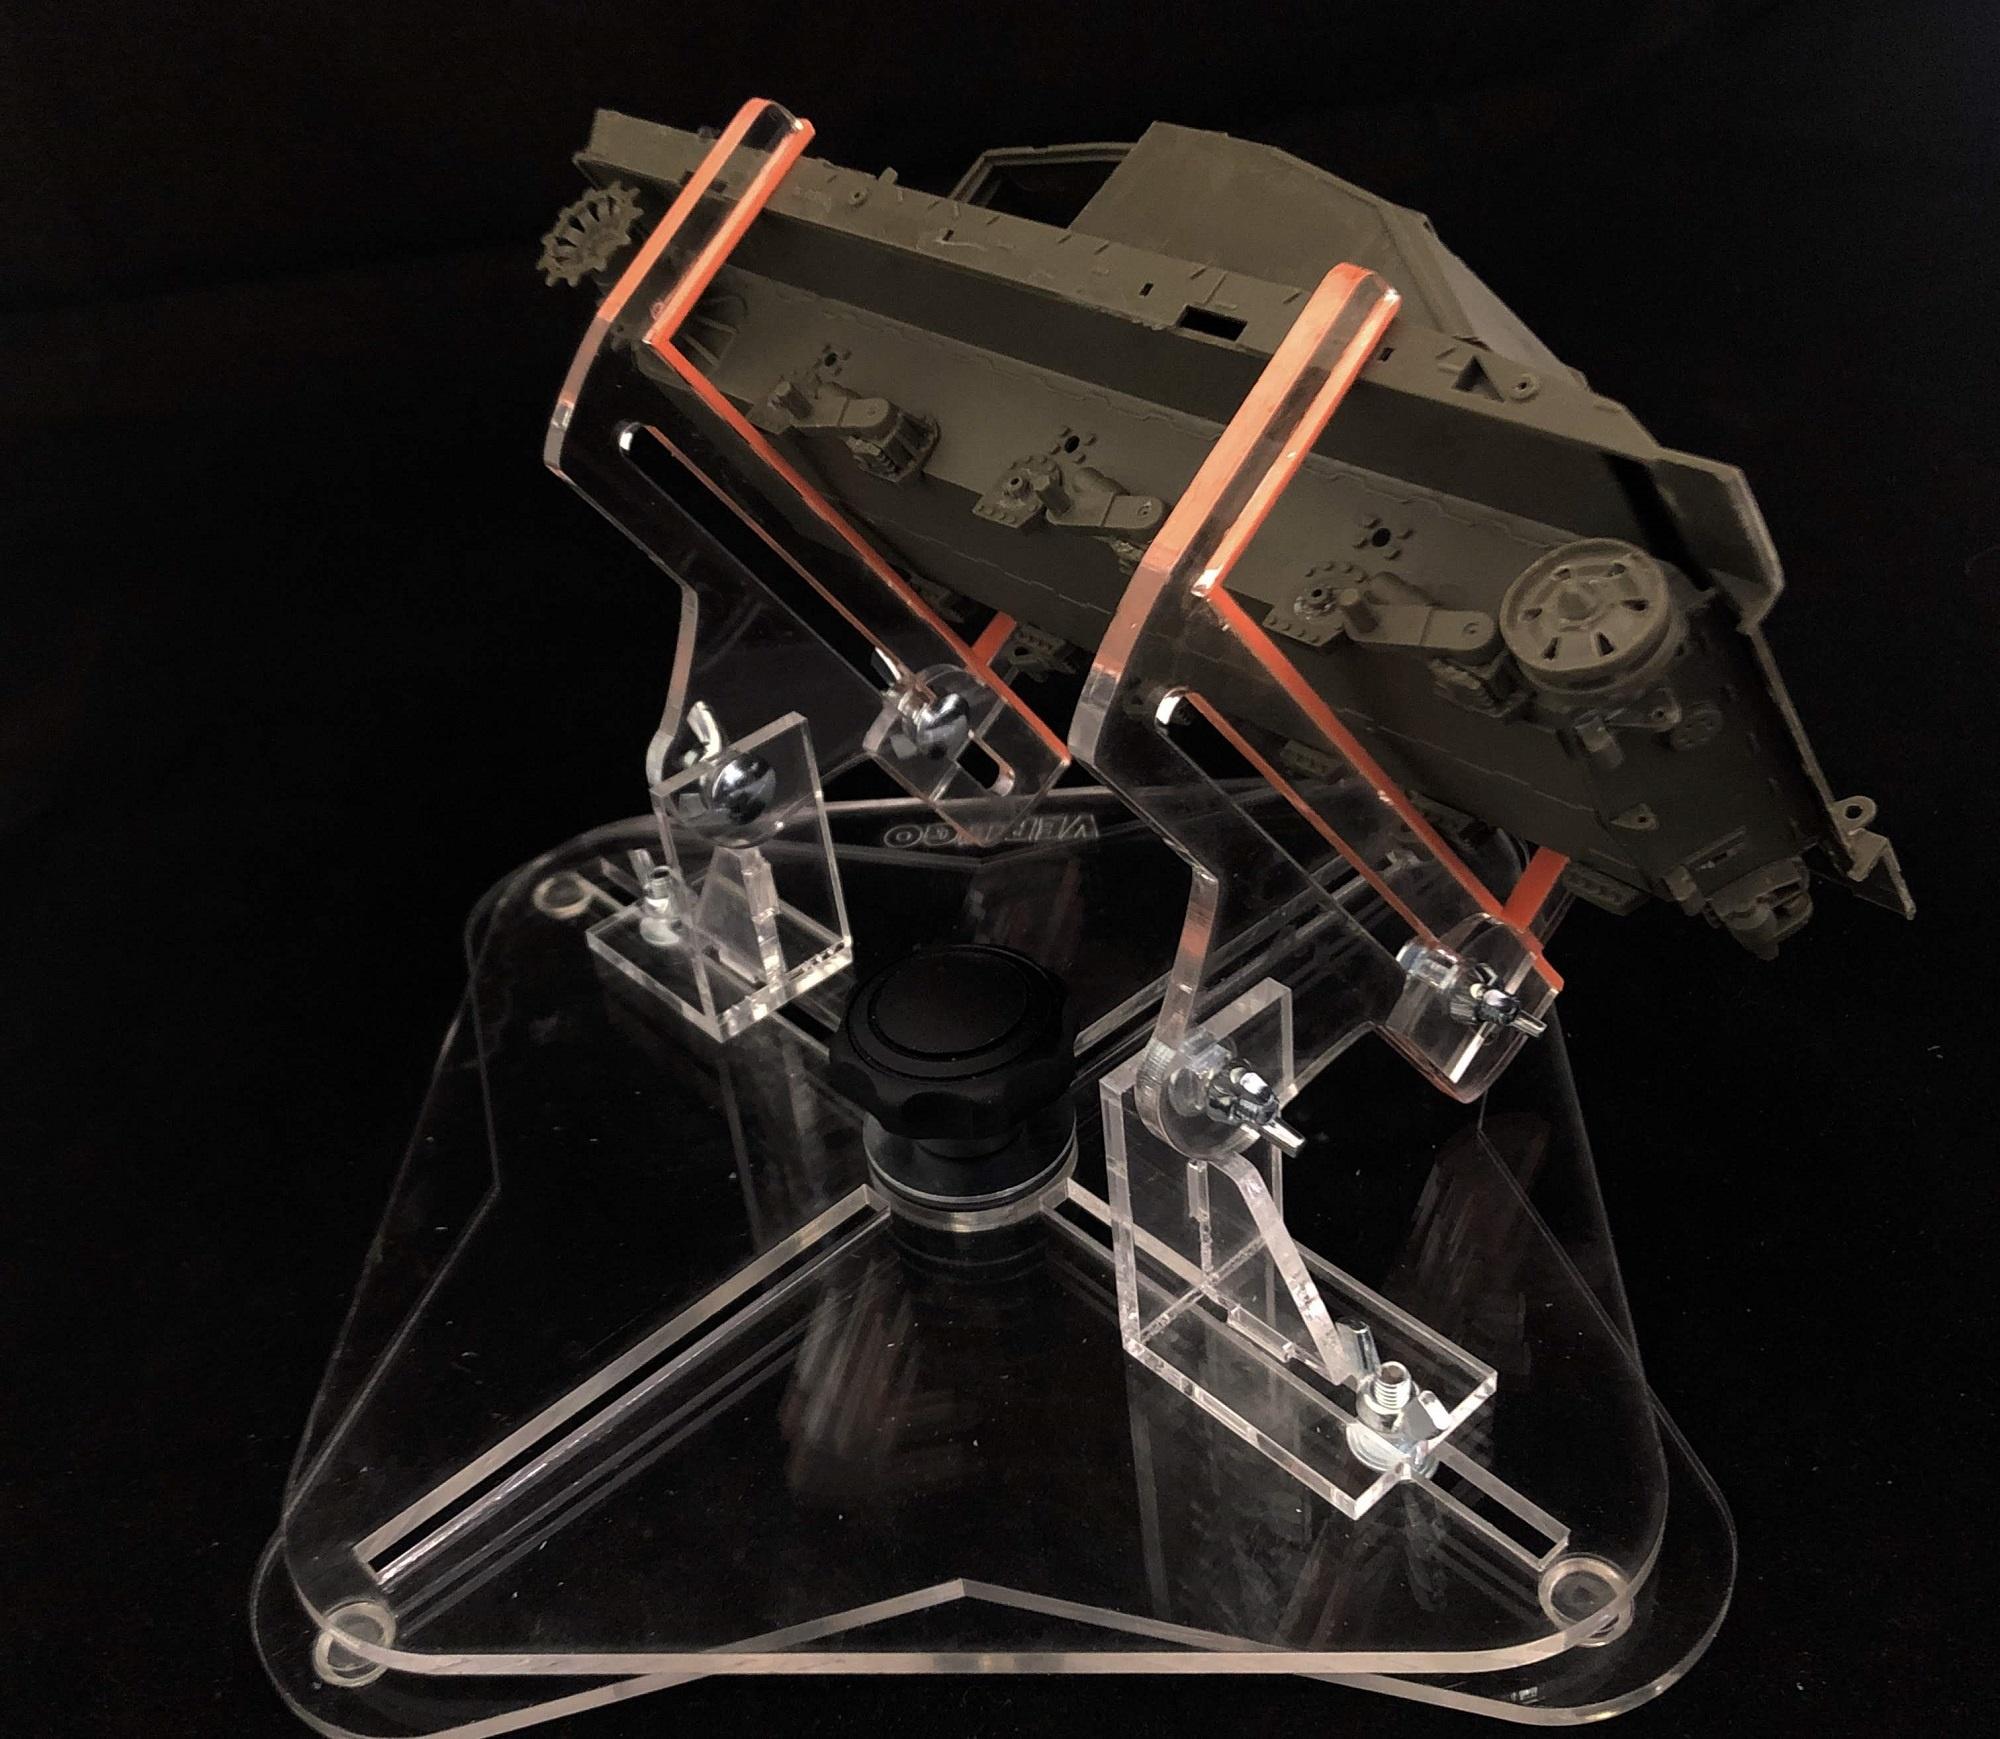 Vertigo Jigs Airbrush III, With Rotary Base, Afv - Vertigo Jigs - VMP026